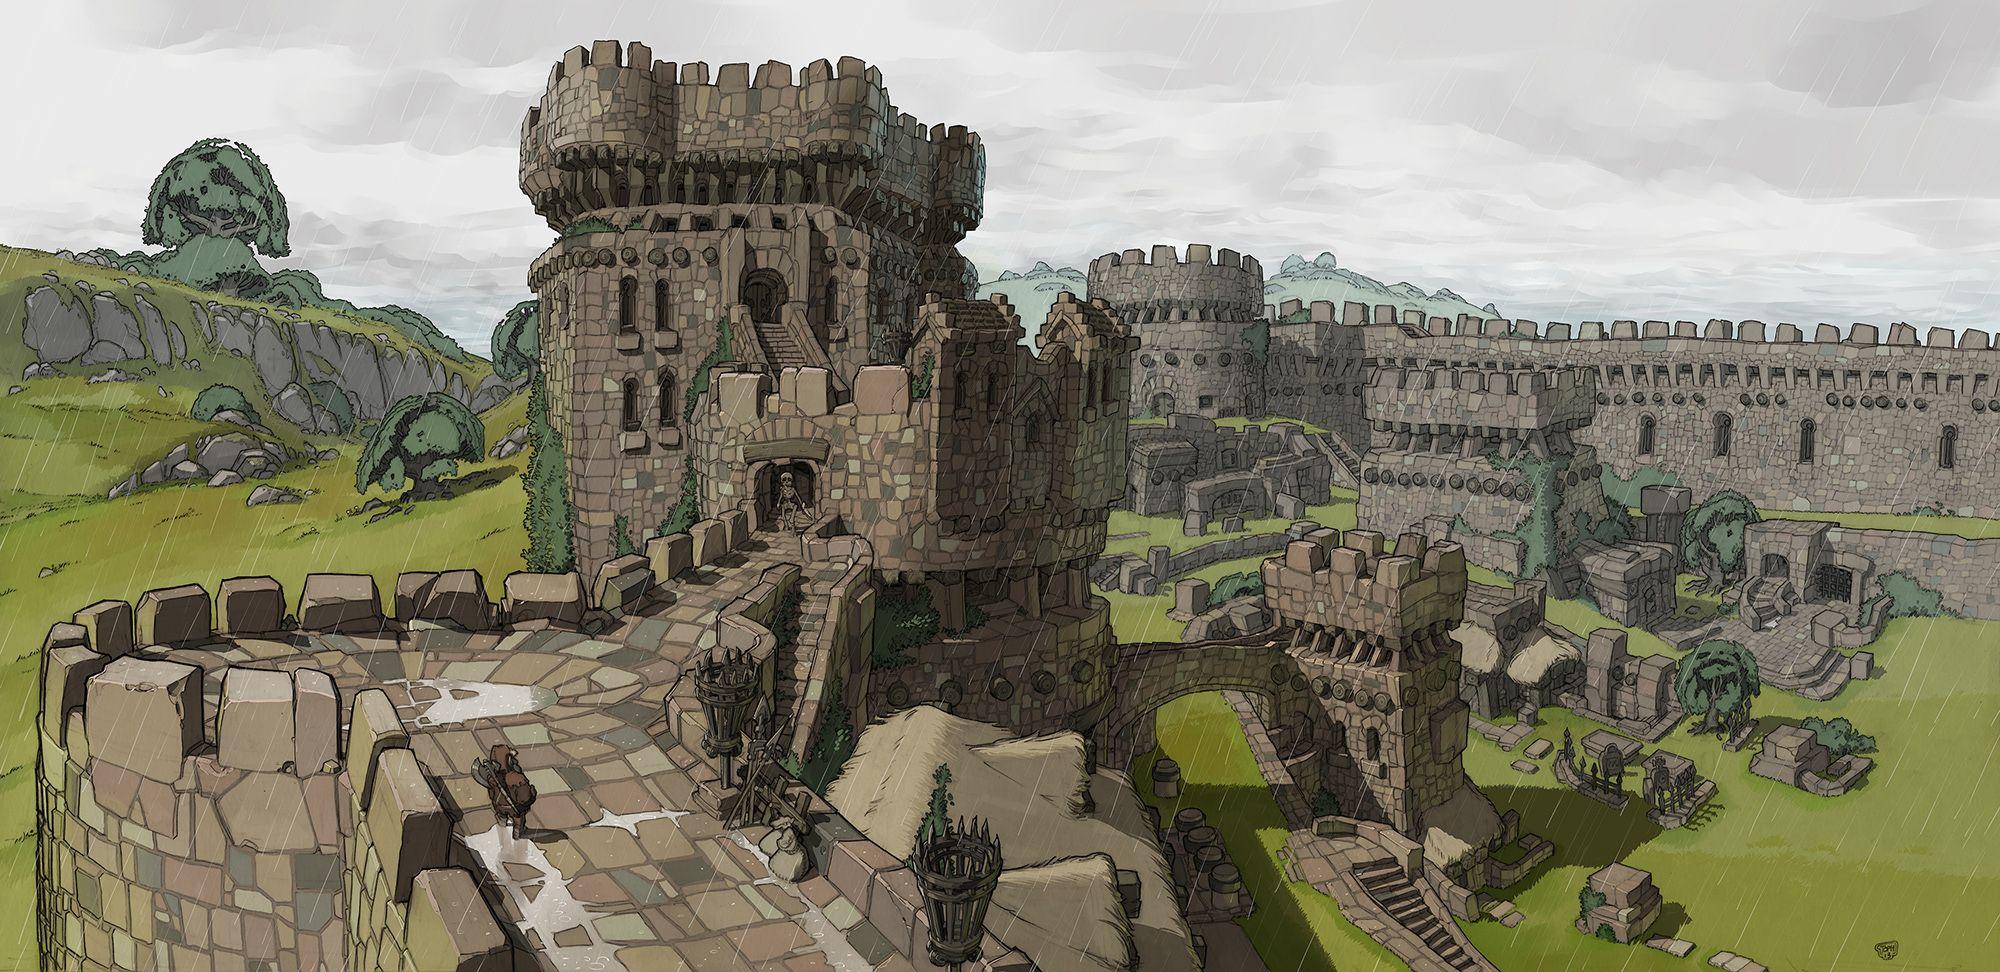 01_Castle.jpg (2000×972)